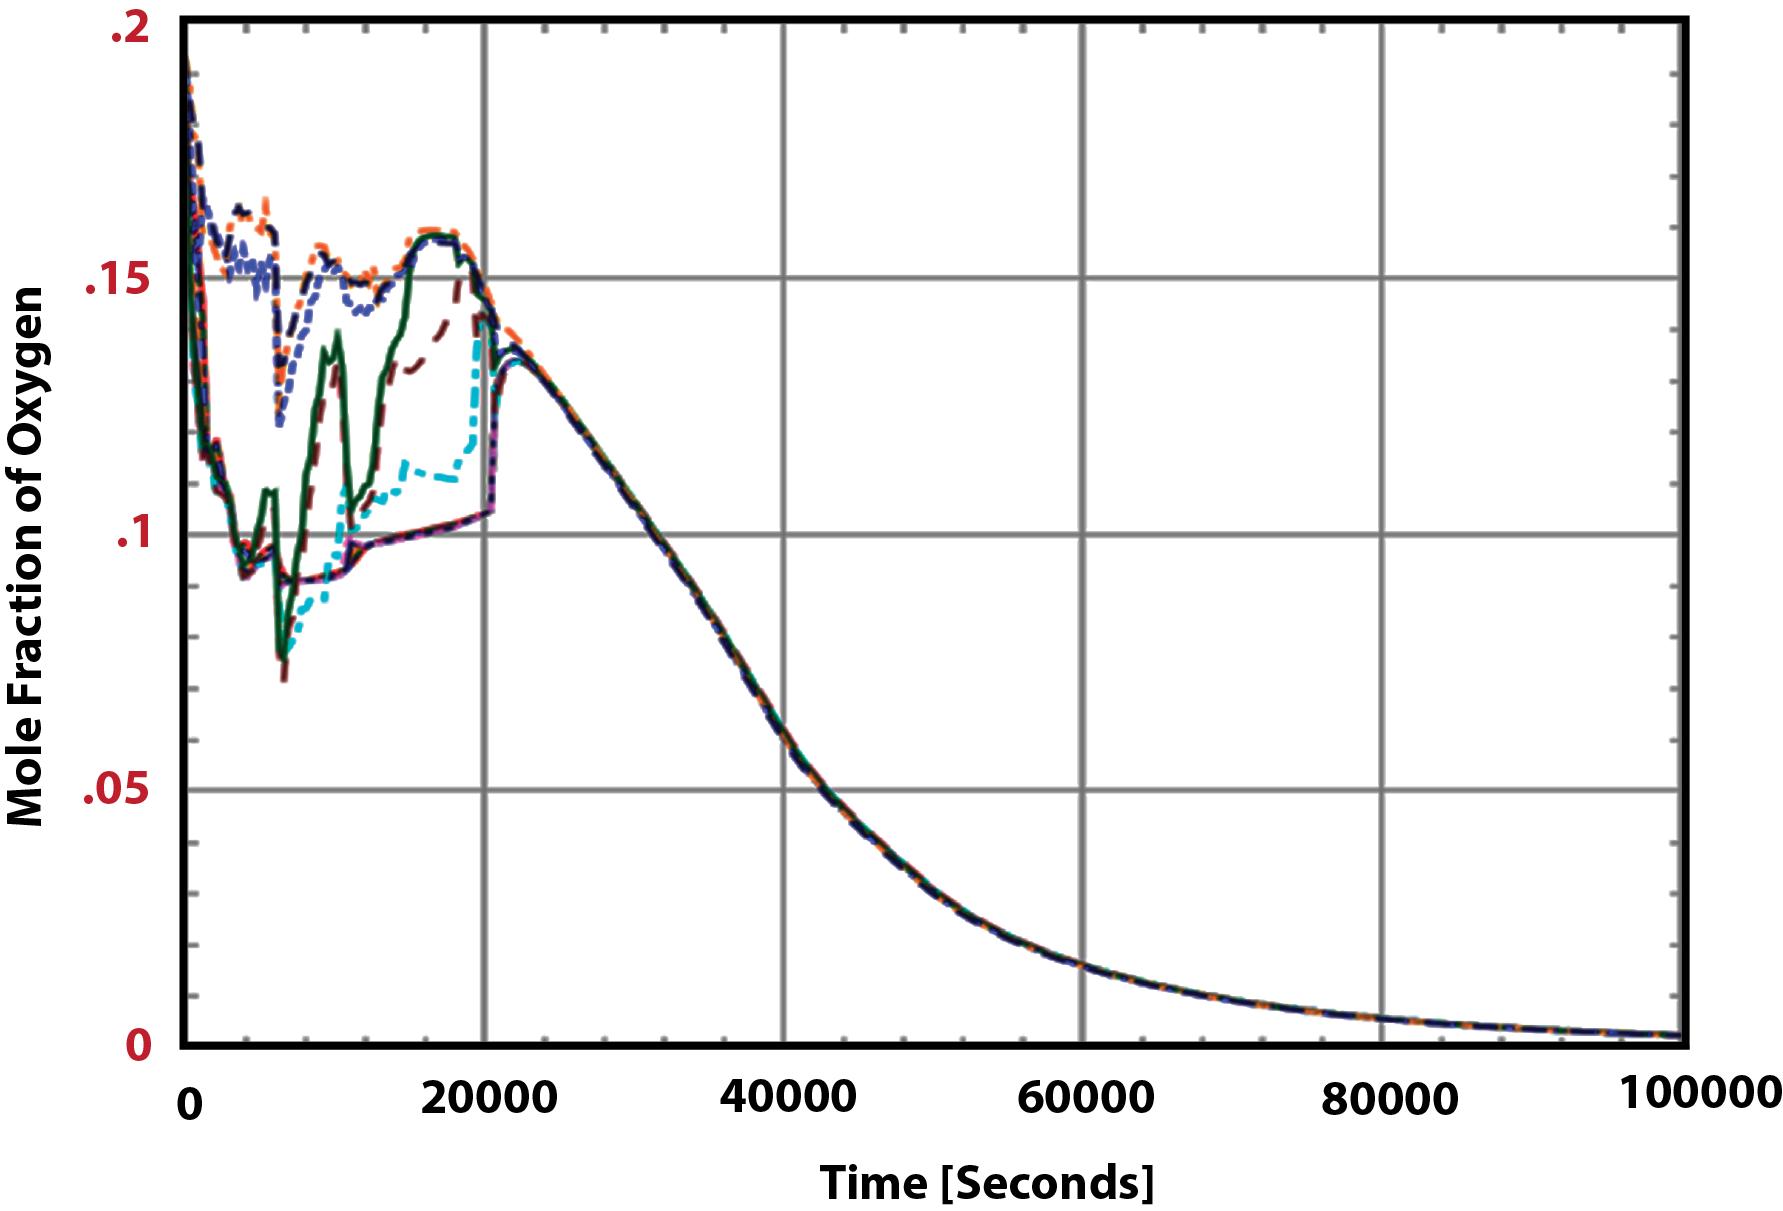 Figure 4 Containment Oxygen Distribution